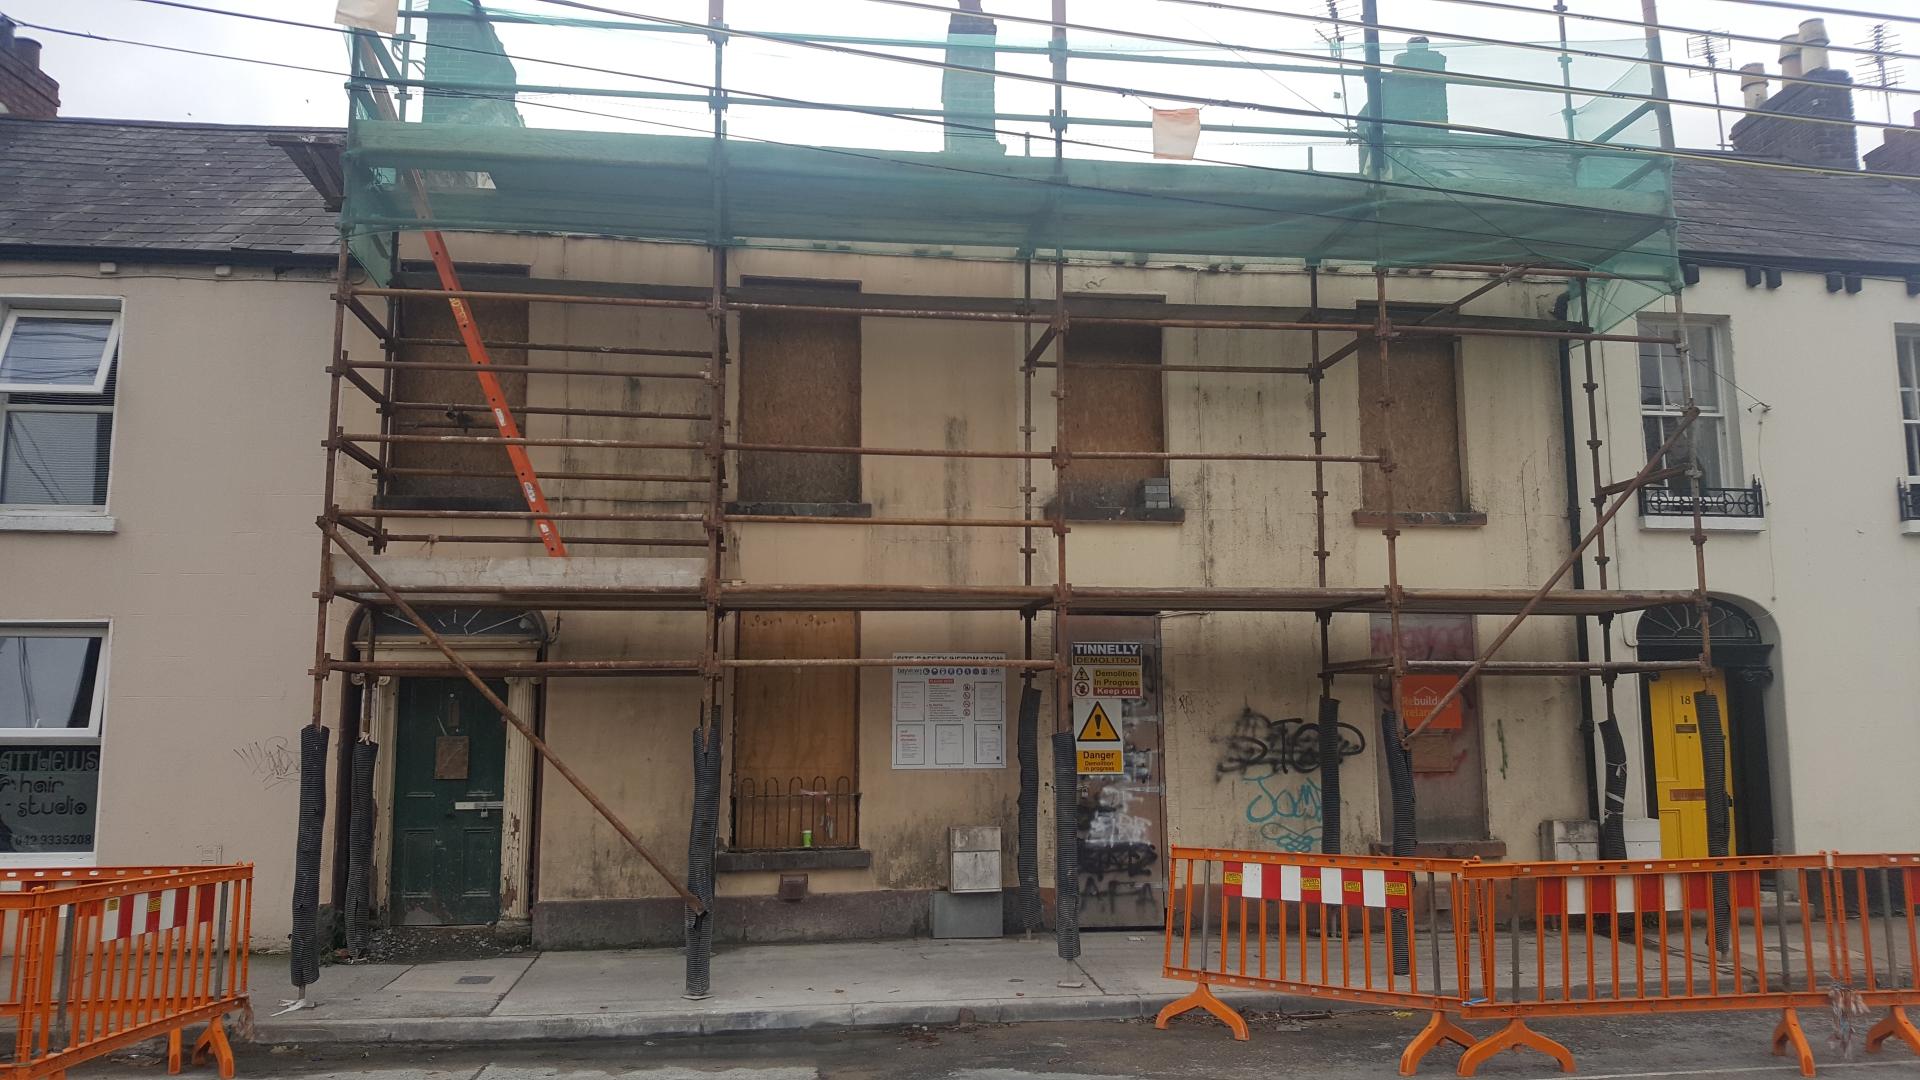 One property in Seatown that is being refurbished under Rebuilding Ireland